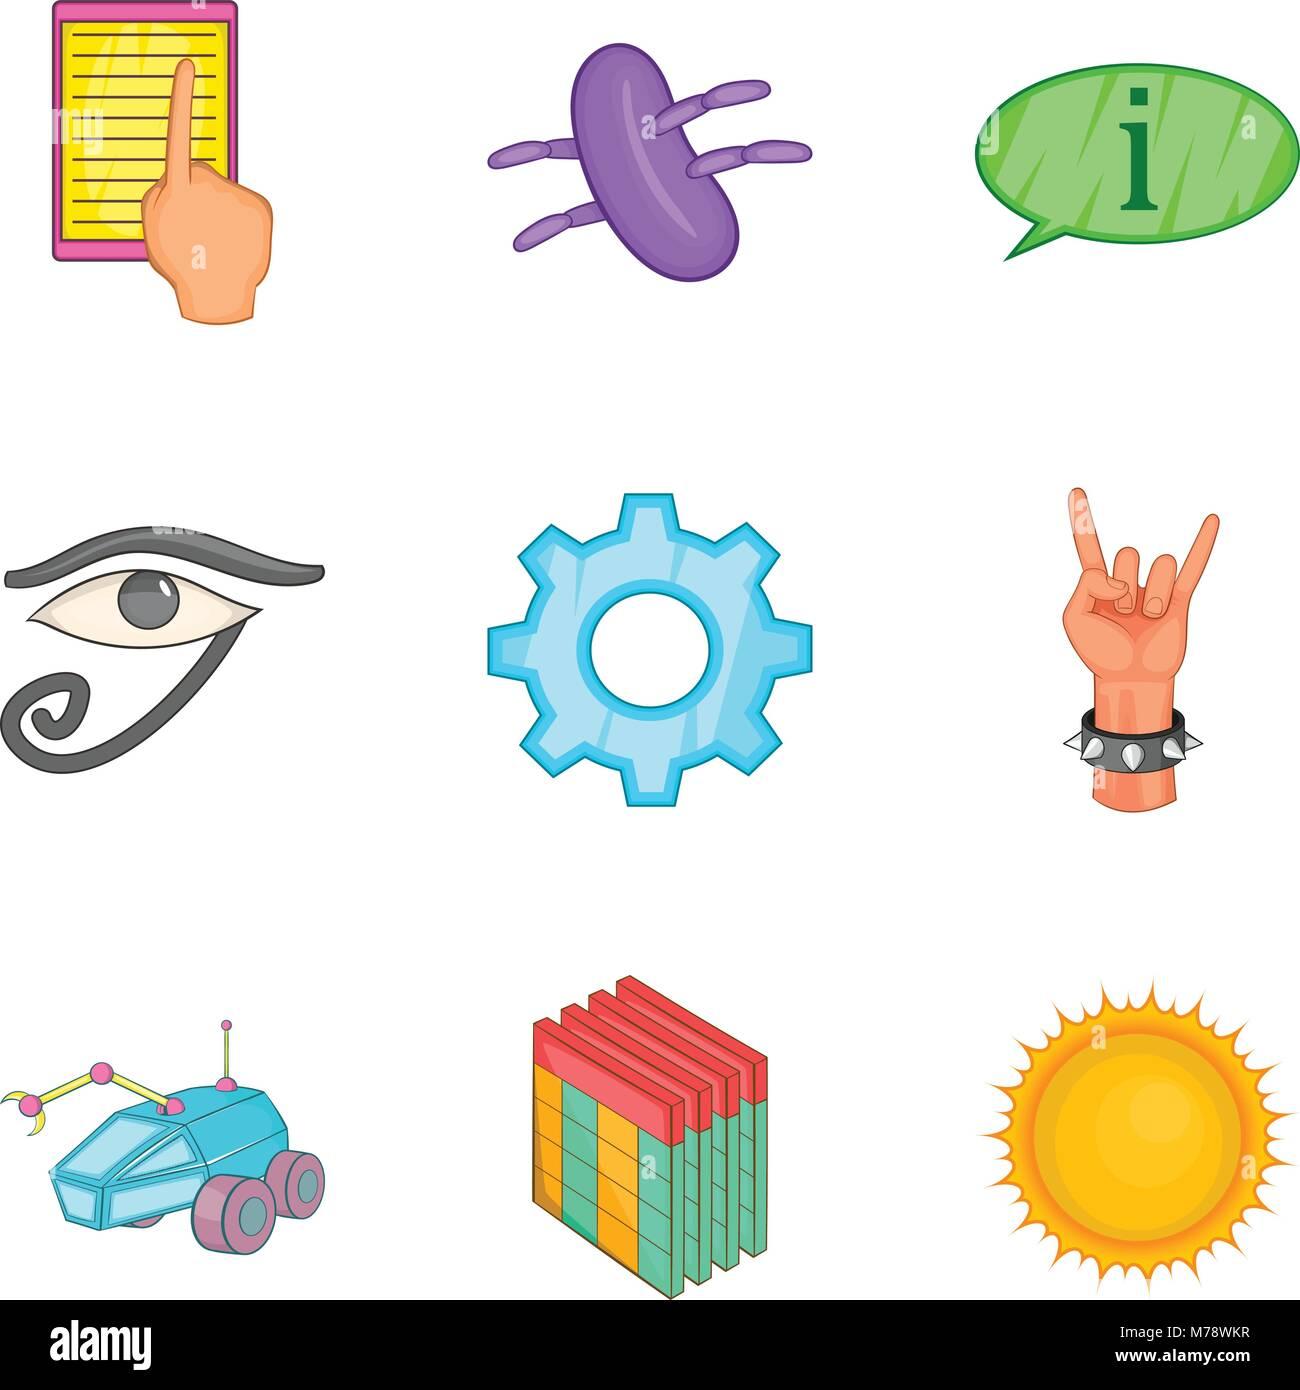 Pose icons set, cartoon style - Stock Vector